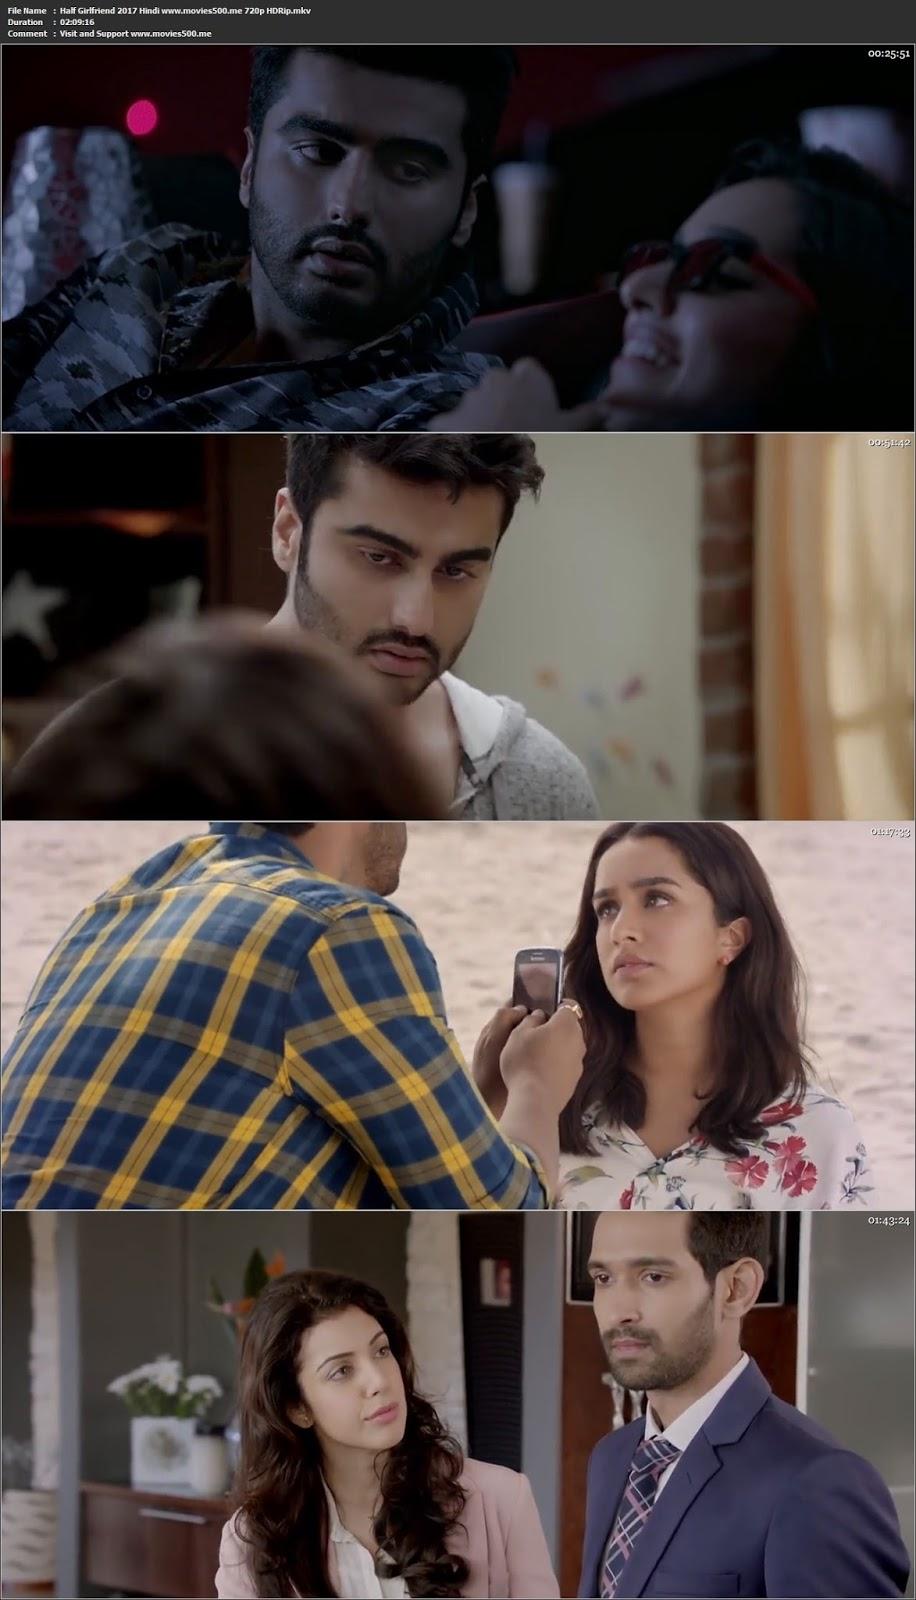 Half Girlfriend 2017 Full Movie Hindi HDRip 720p at movies500.me